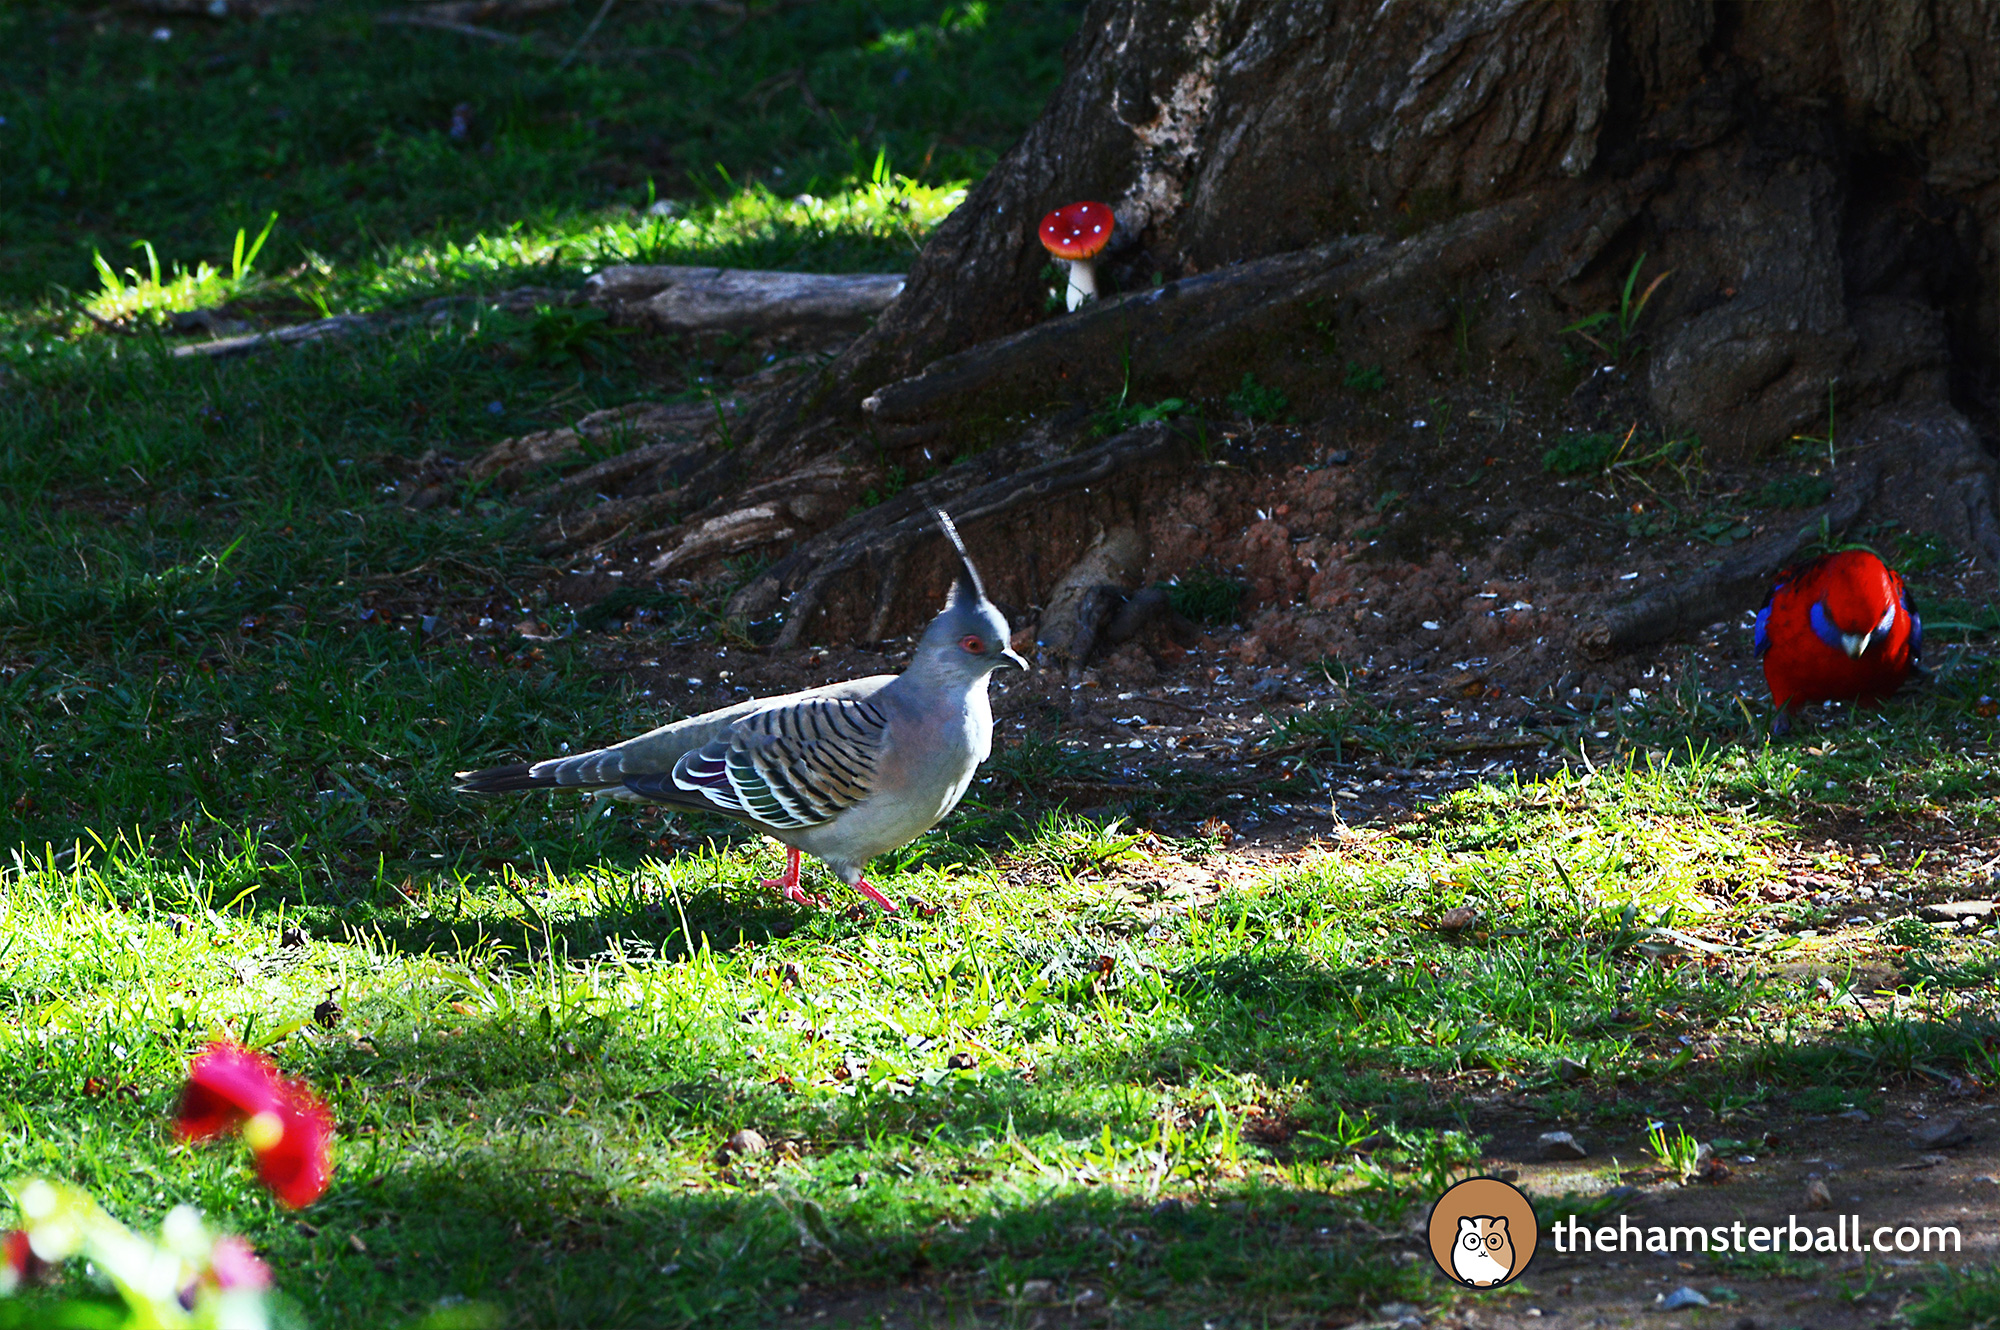 The Fudge Shop, Springbrook, cockatoos, environment, nature, crimson rosella, crested pigeon